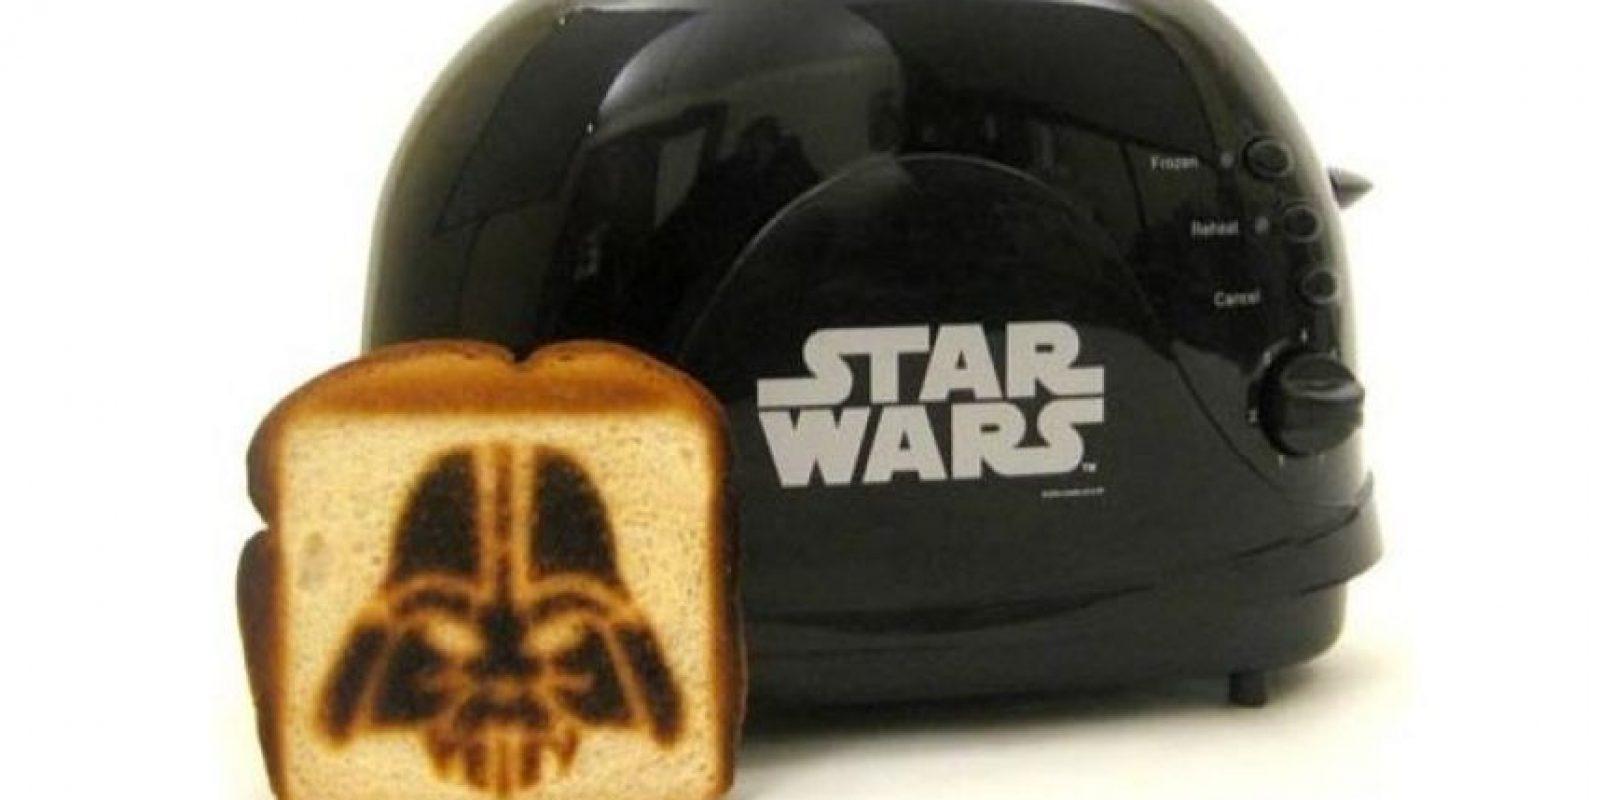 Tostadora de Star Wars Foto:Publimetro México